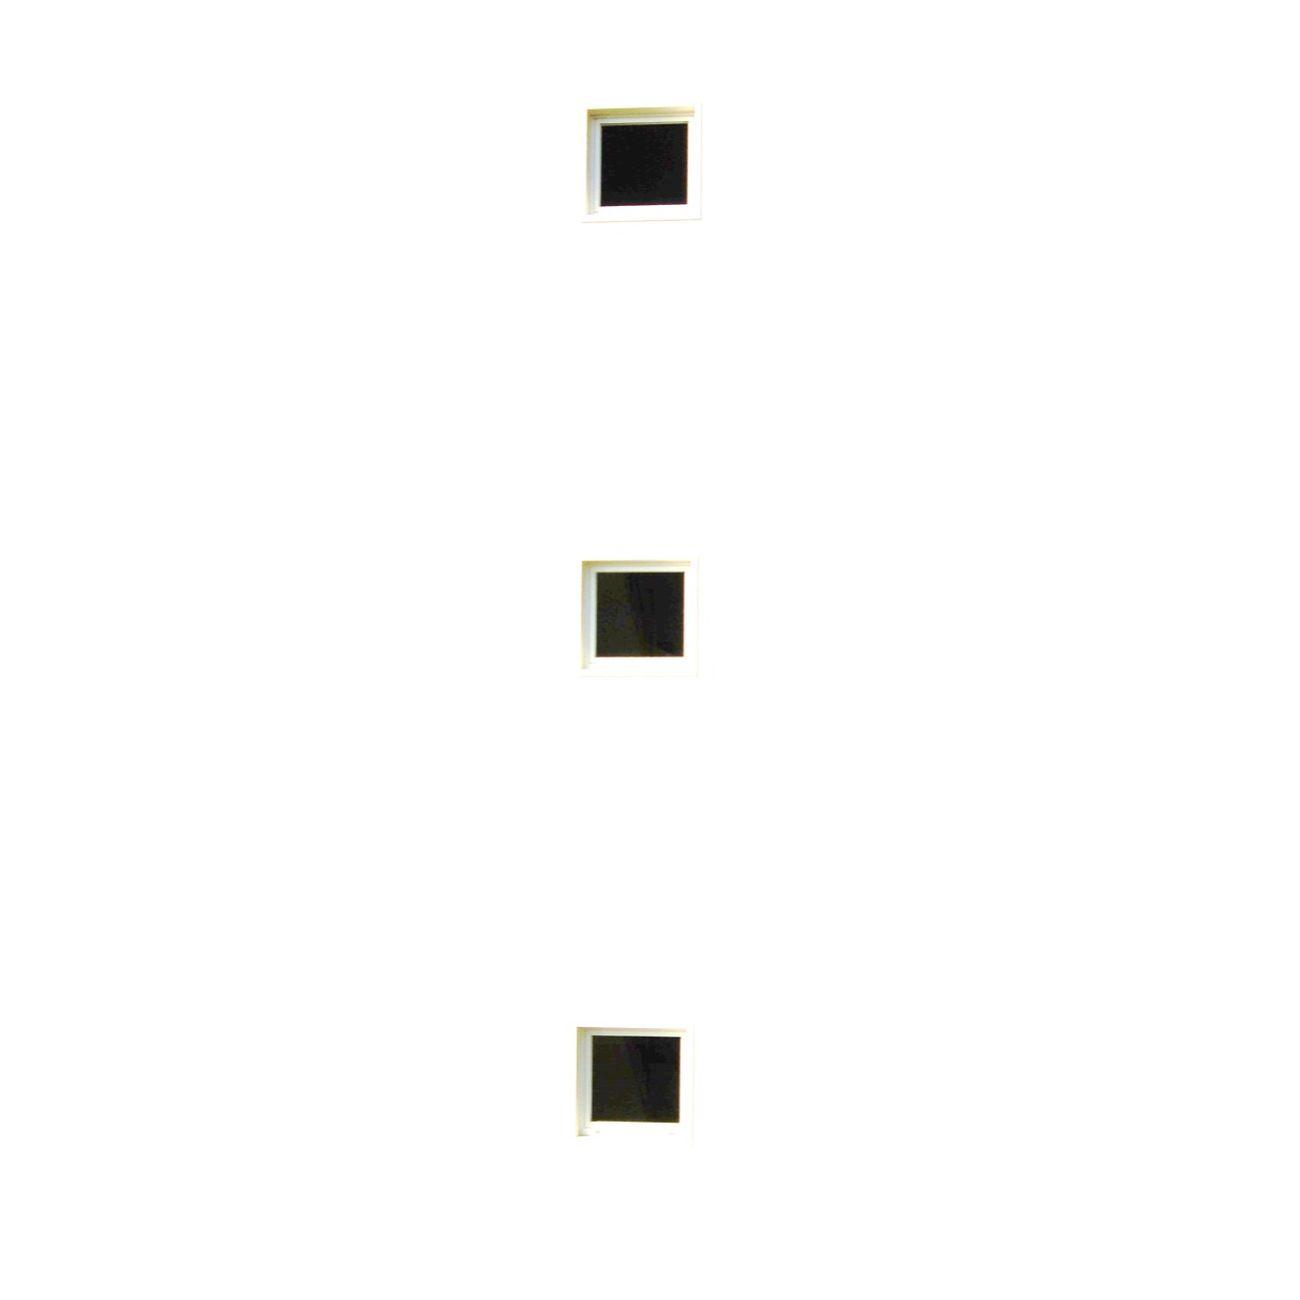 Monochrome (null)